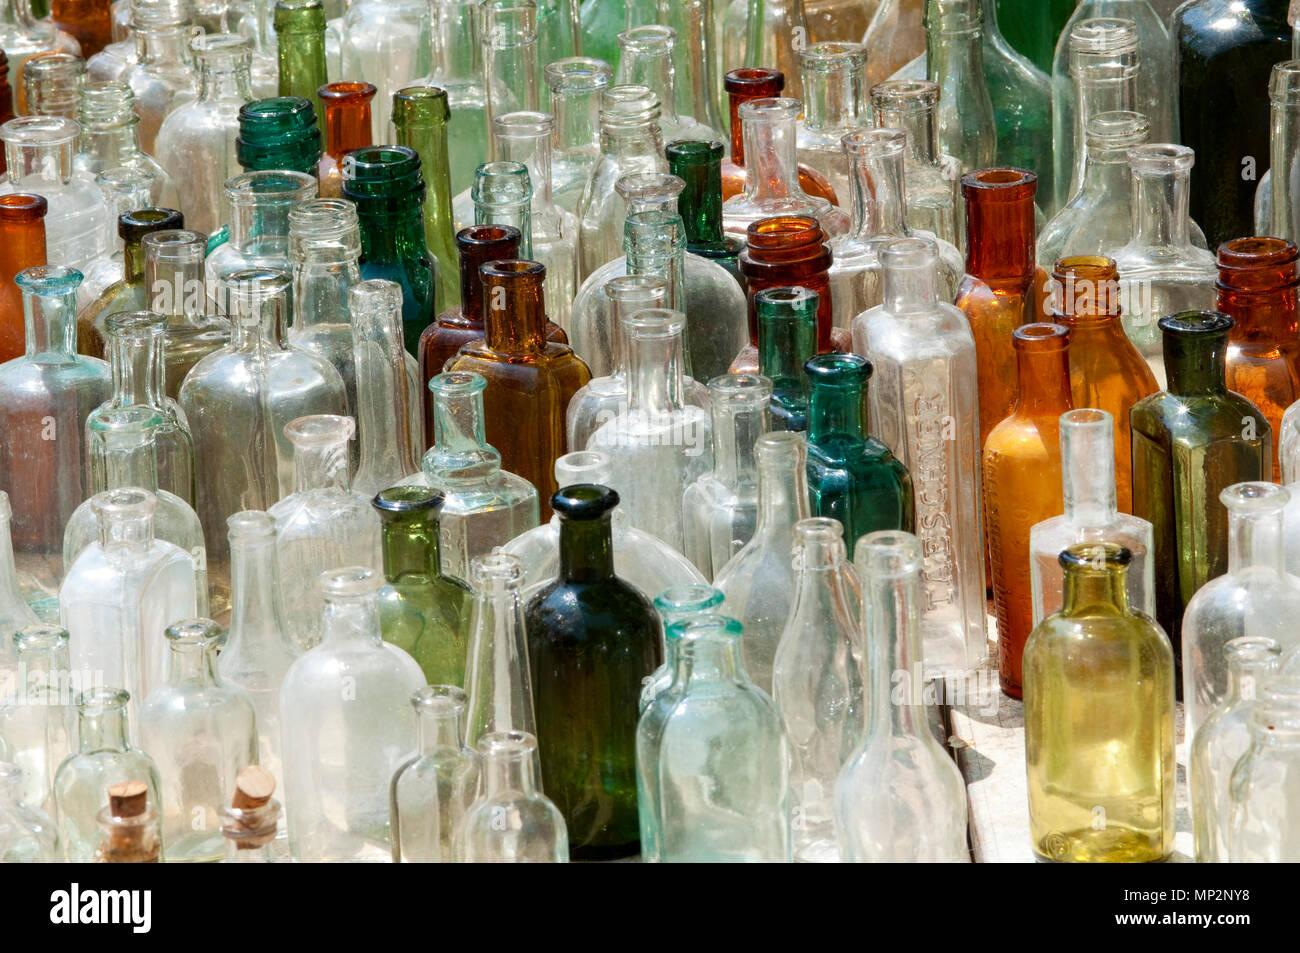 Empty Glass Bottles - Stock Image